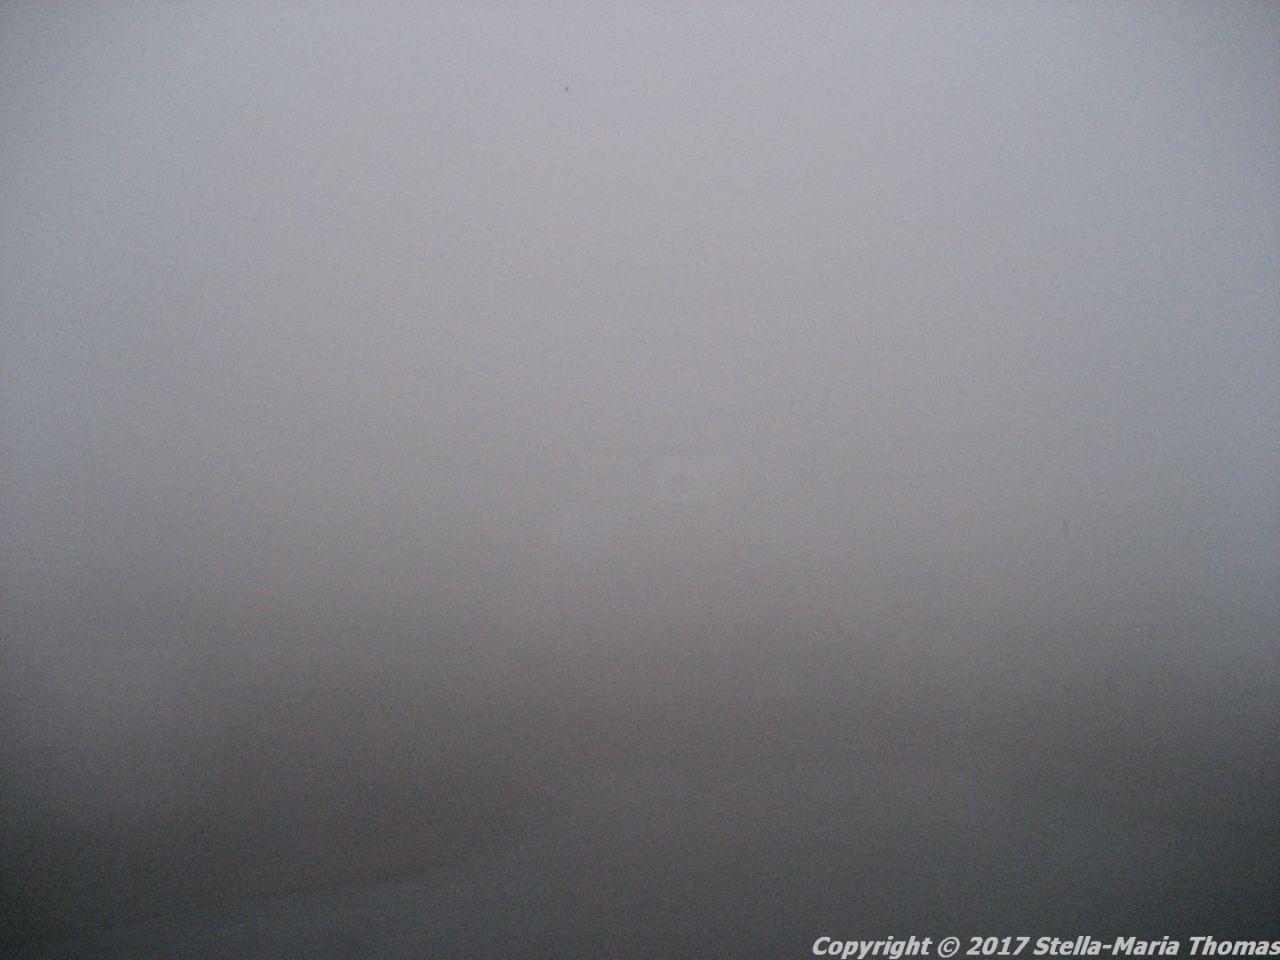 copenhagen-in-the-fog-001